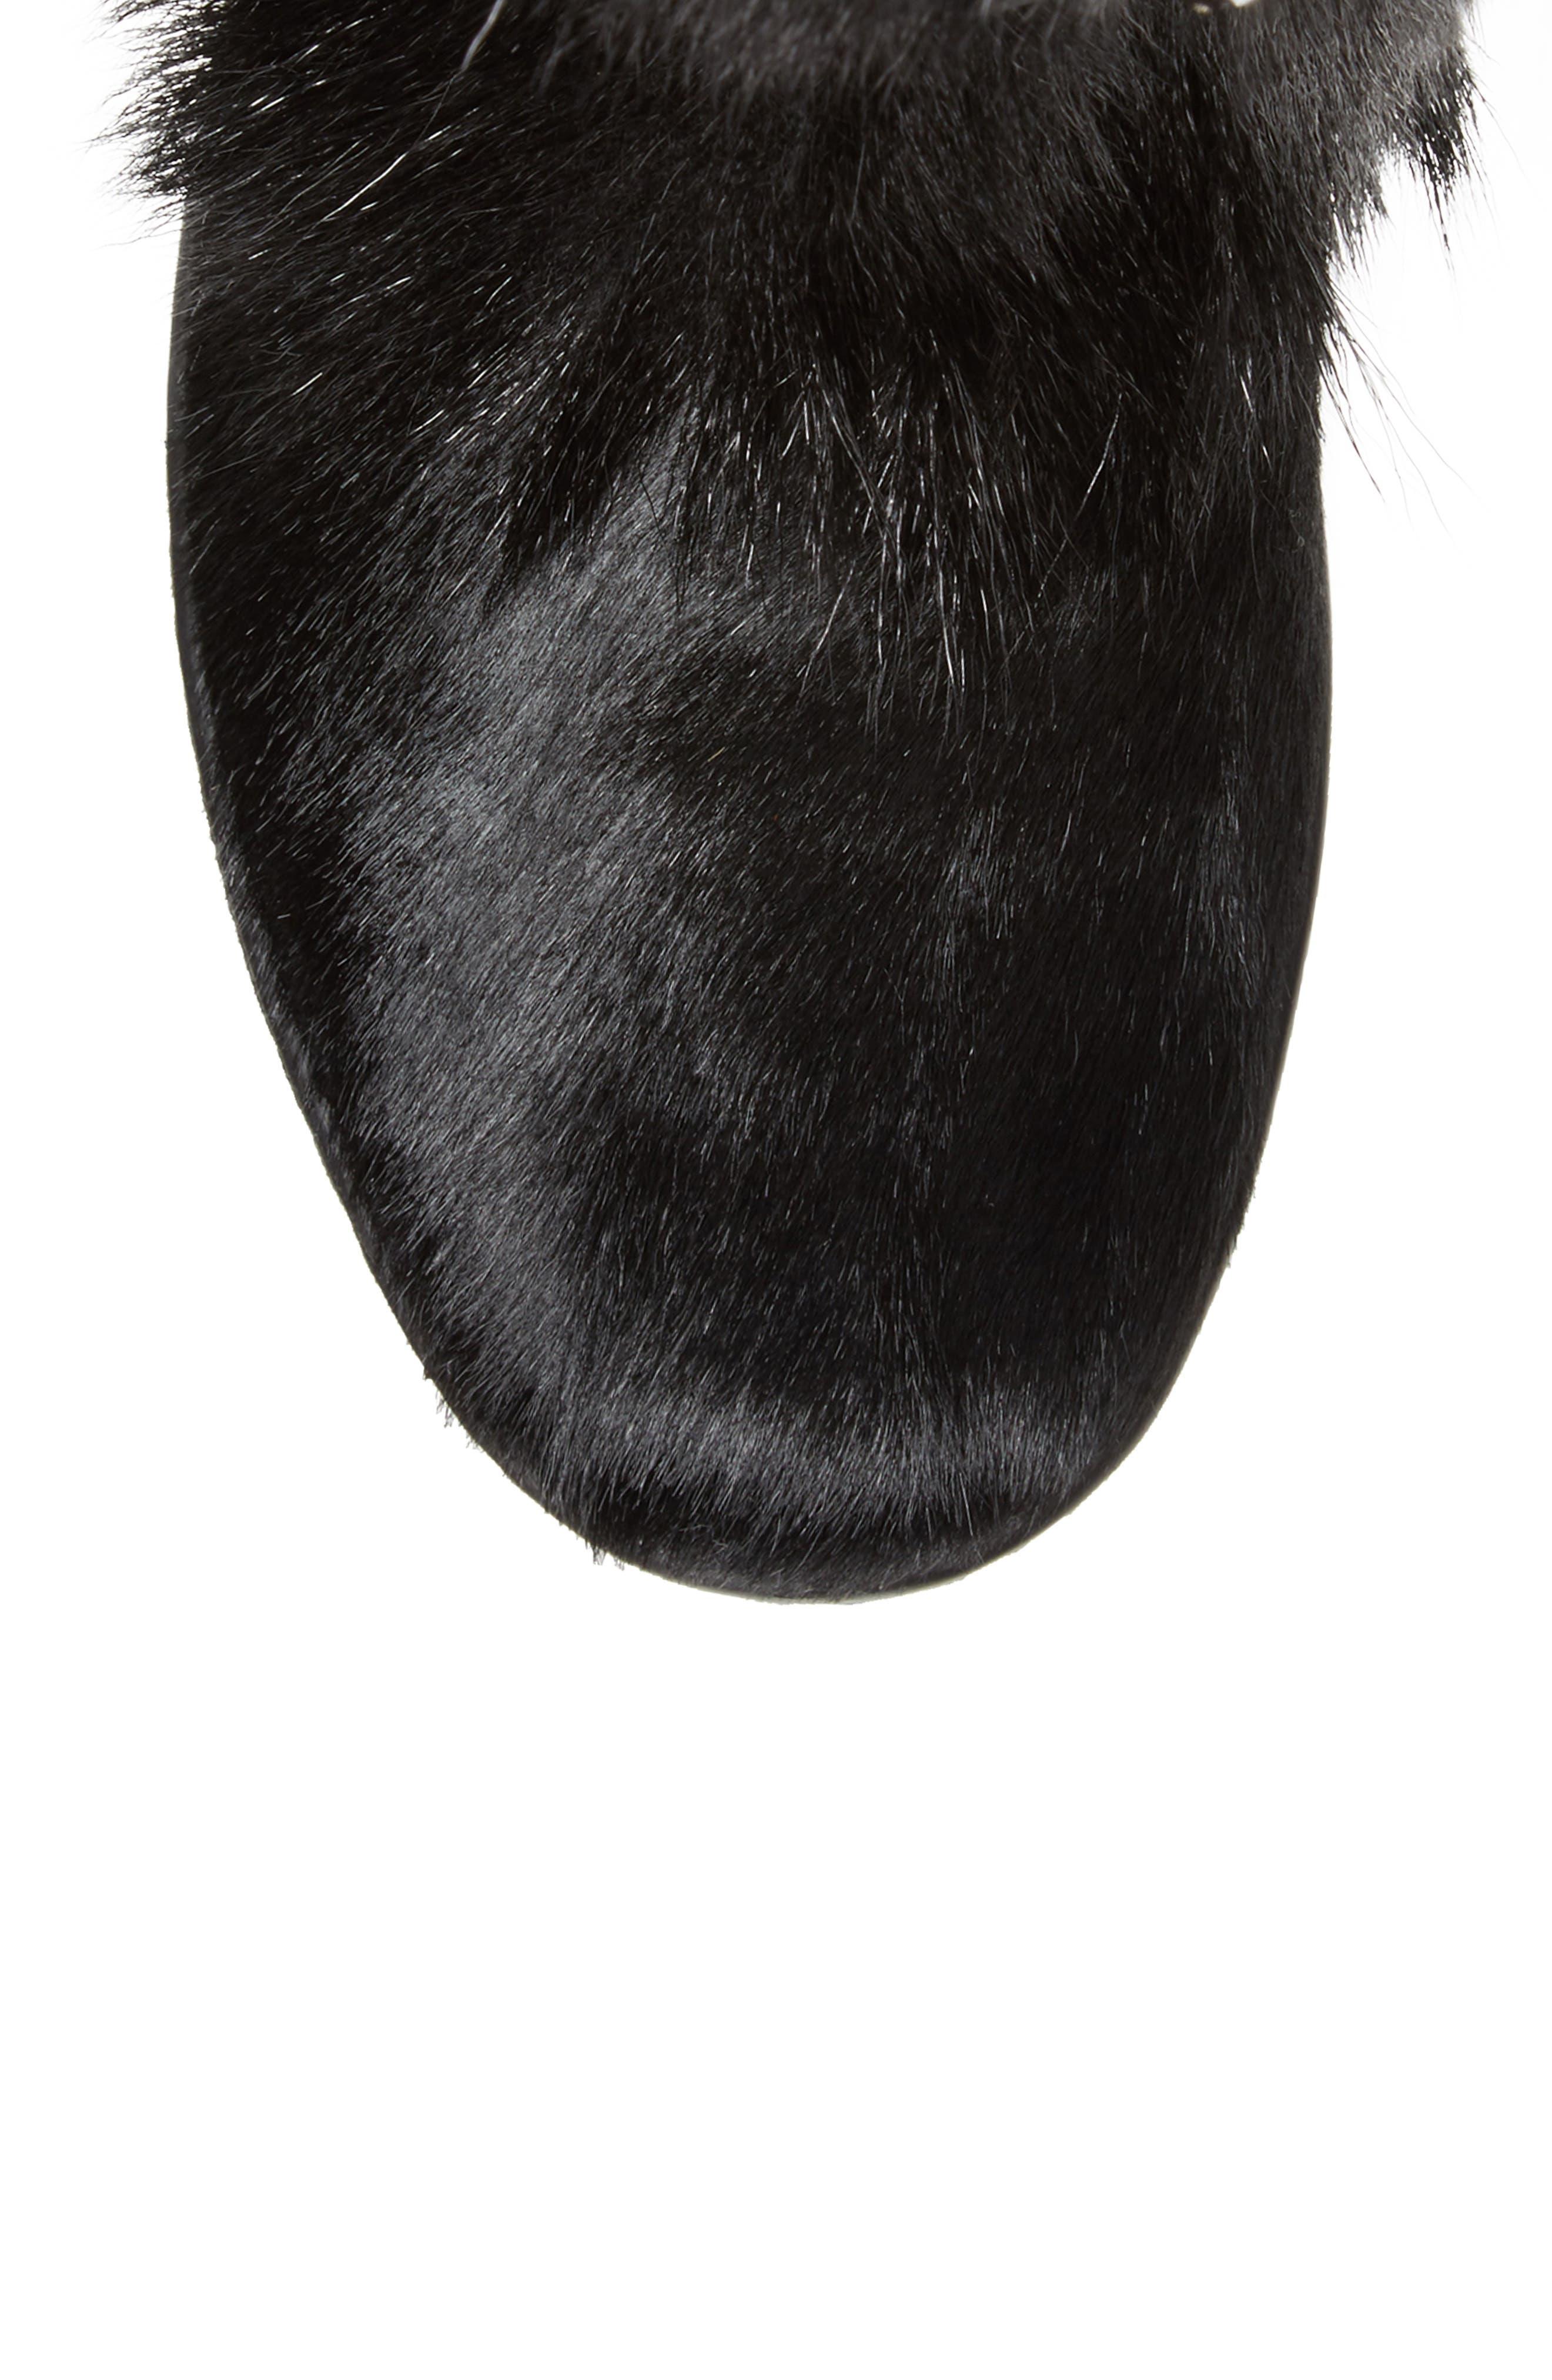 Davos Genuine Goat Fur Boot,                             Alternate thumbnail 5, color,                             001